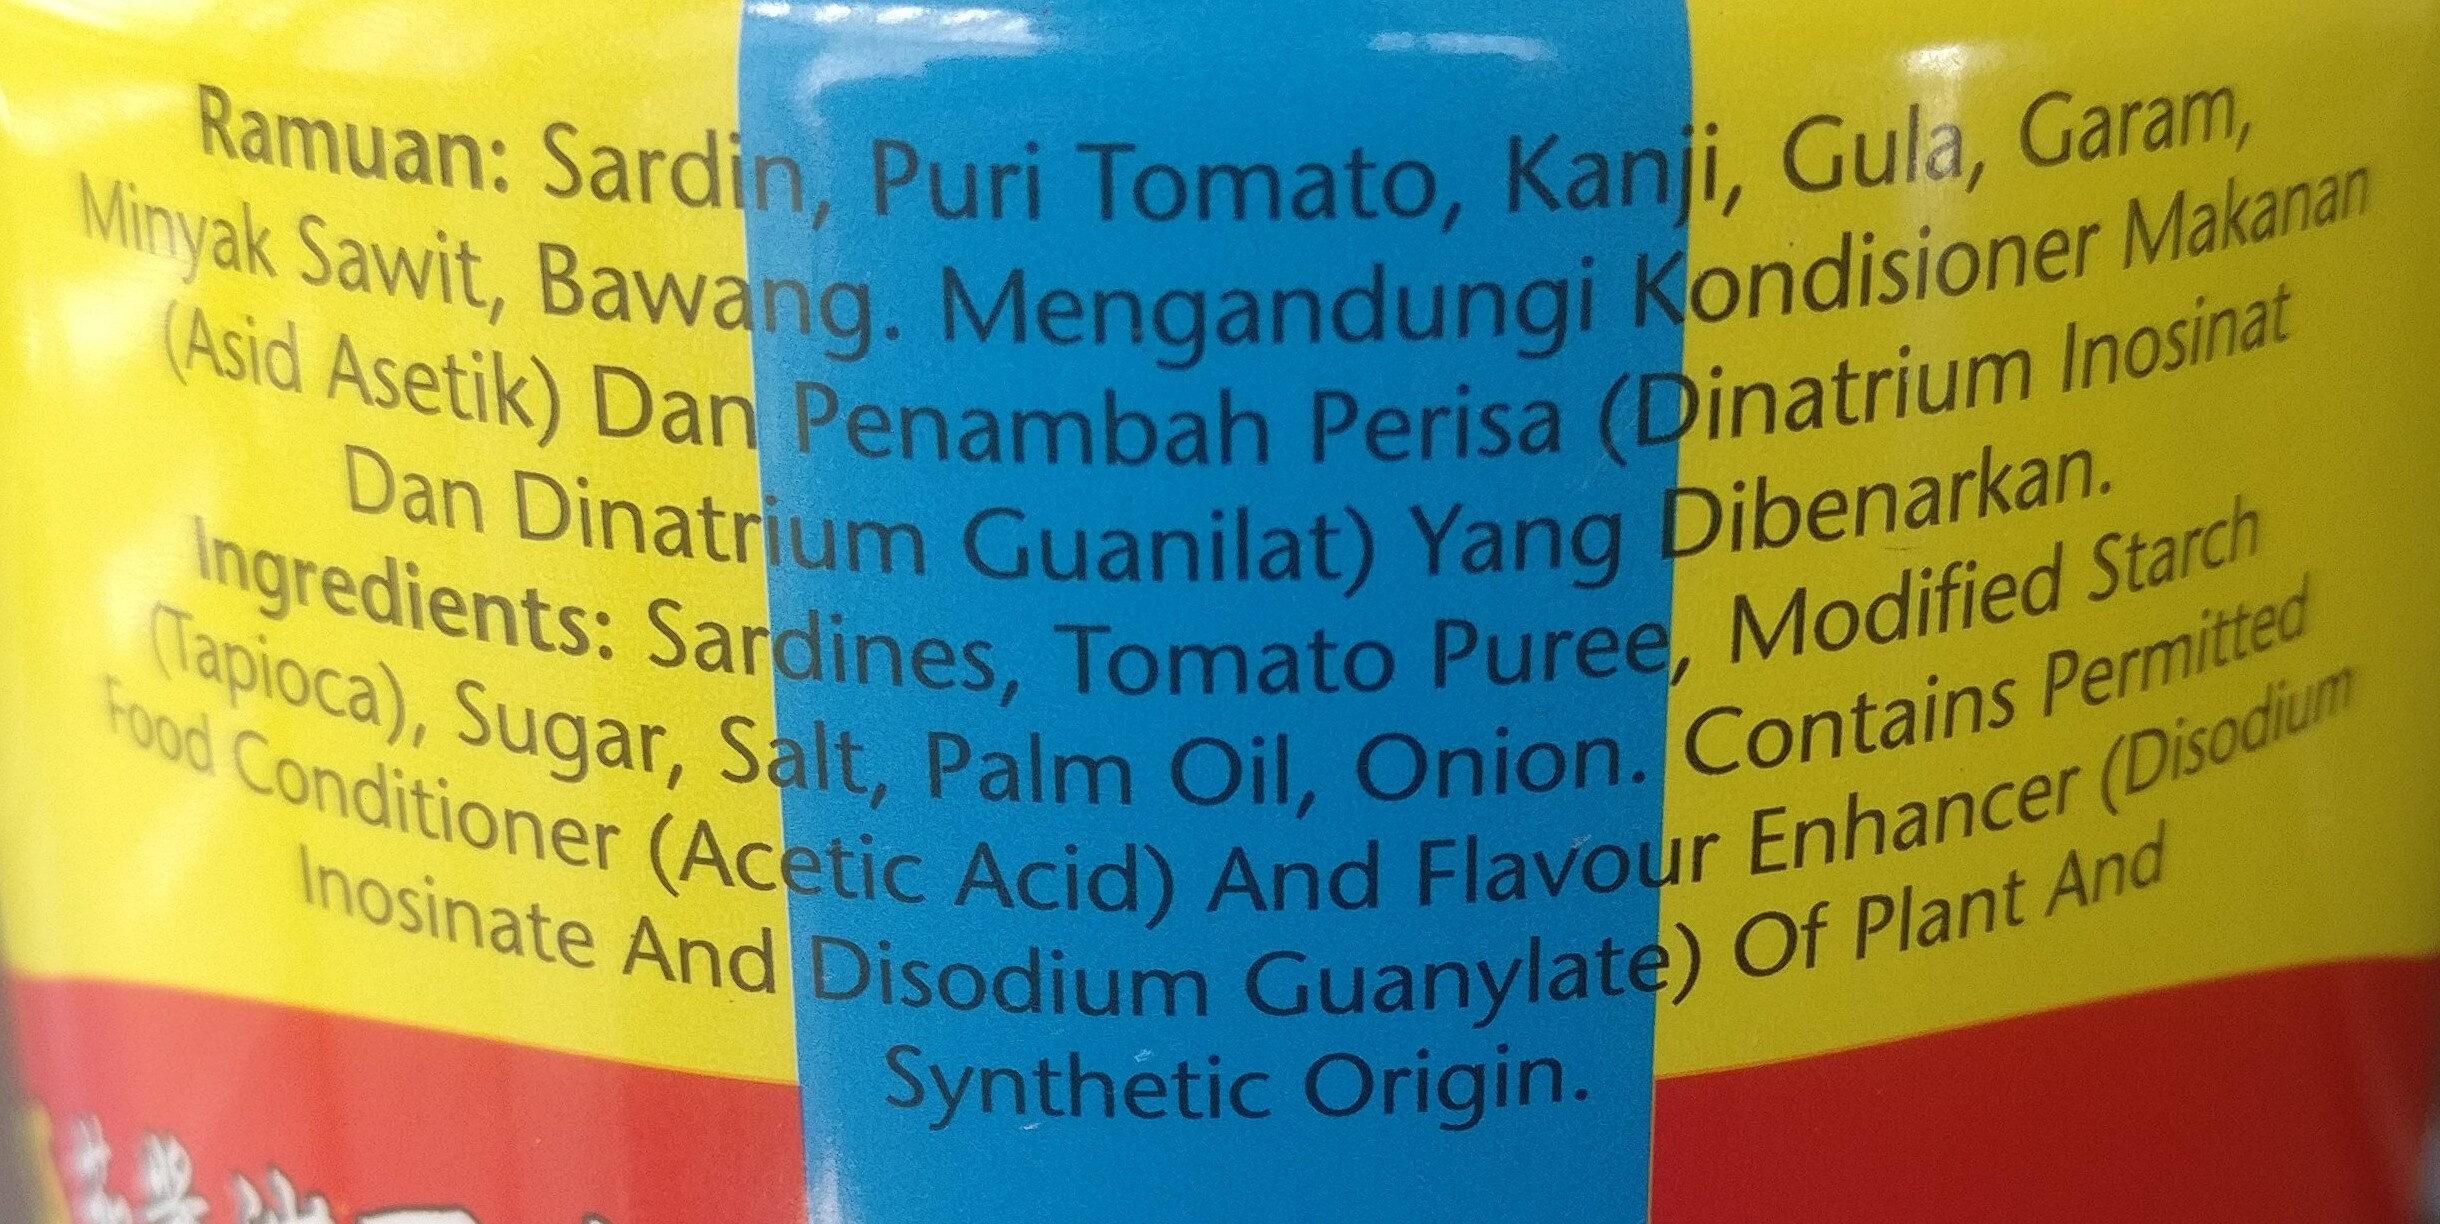 Sardines in Tomato Sauce - Ingredients